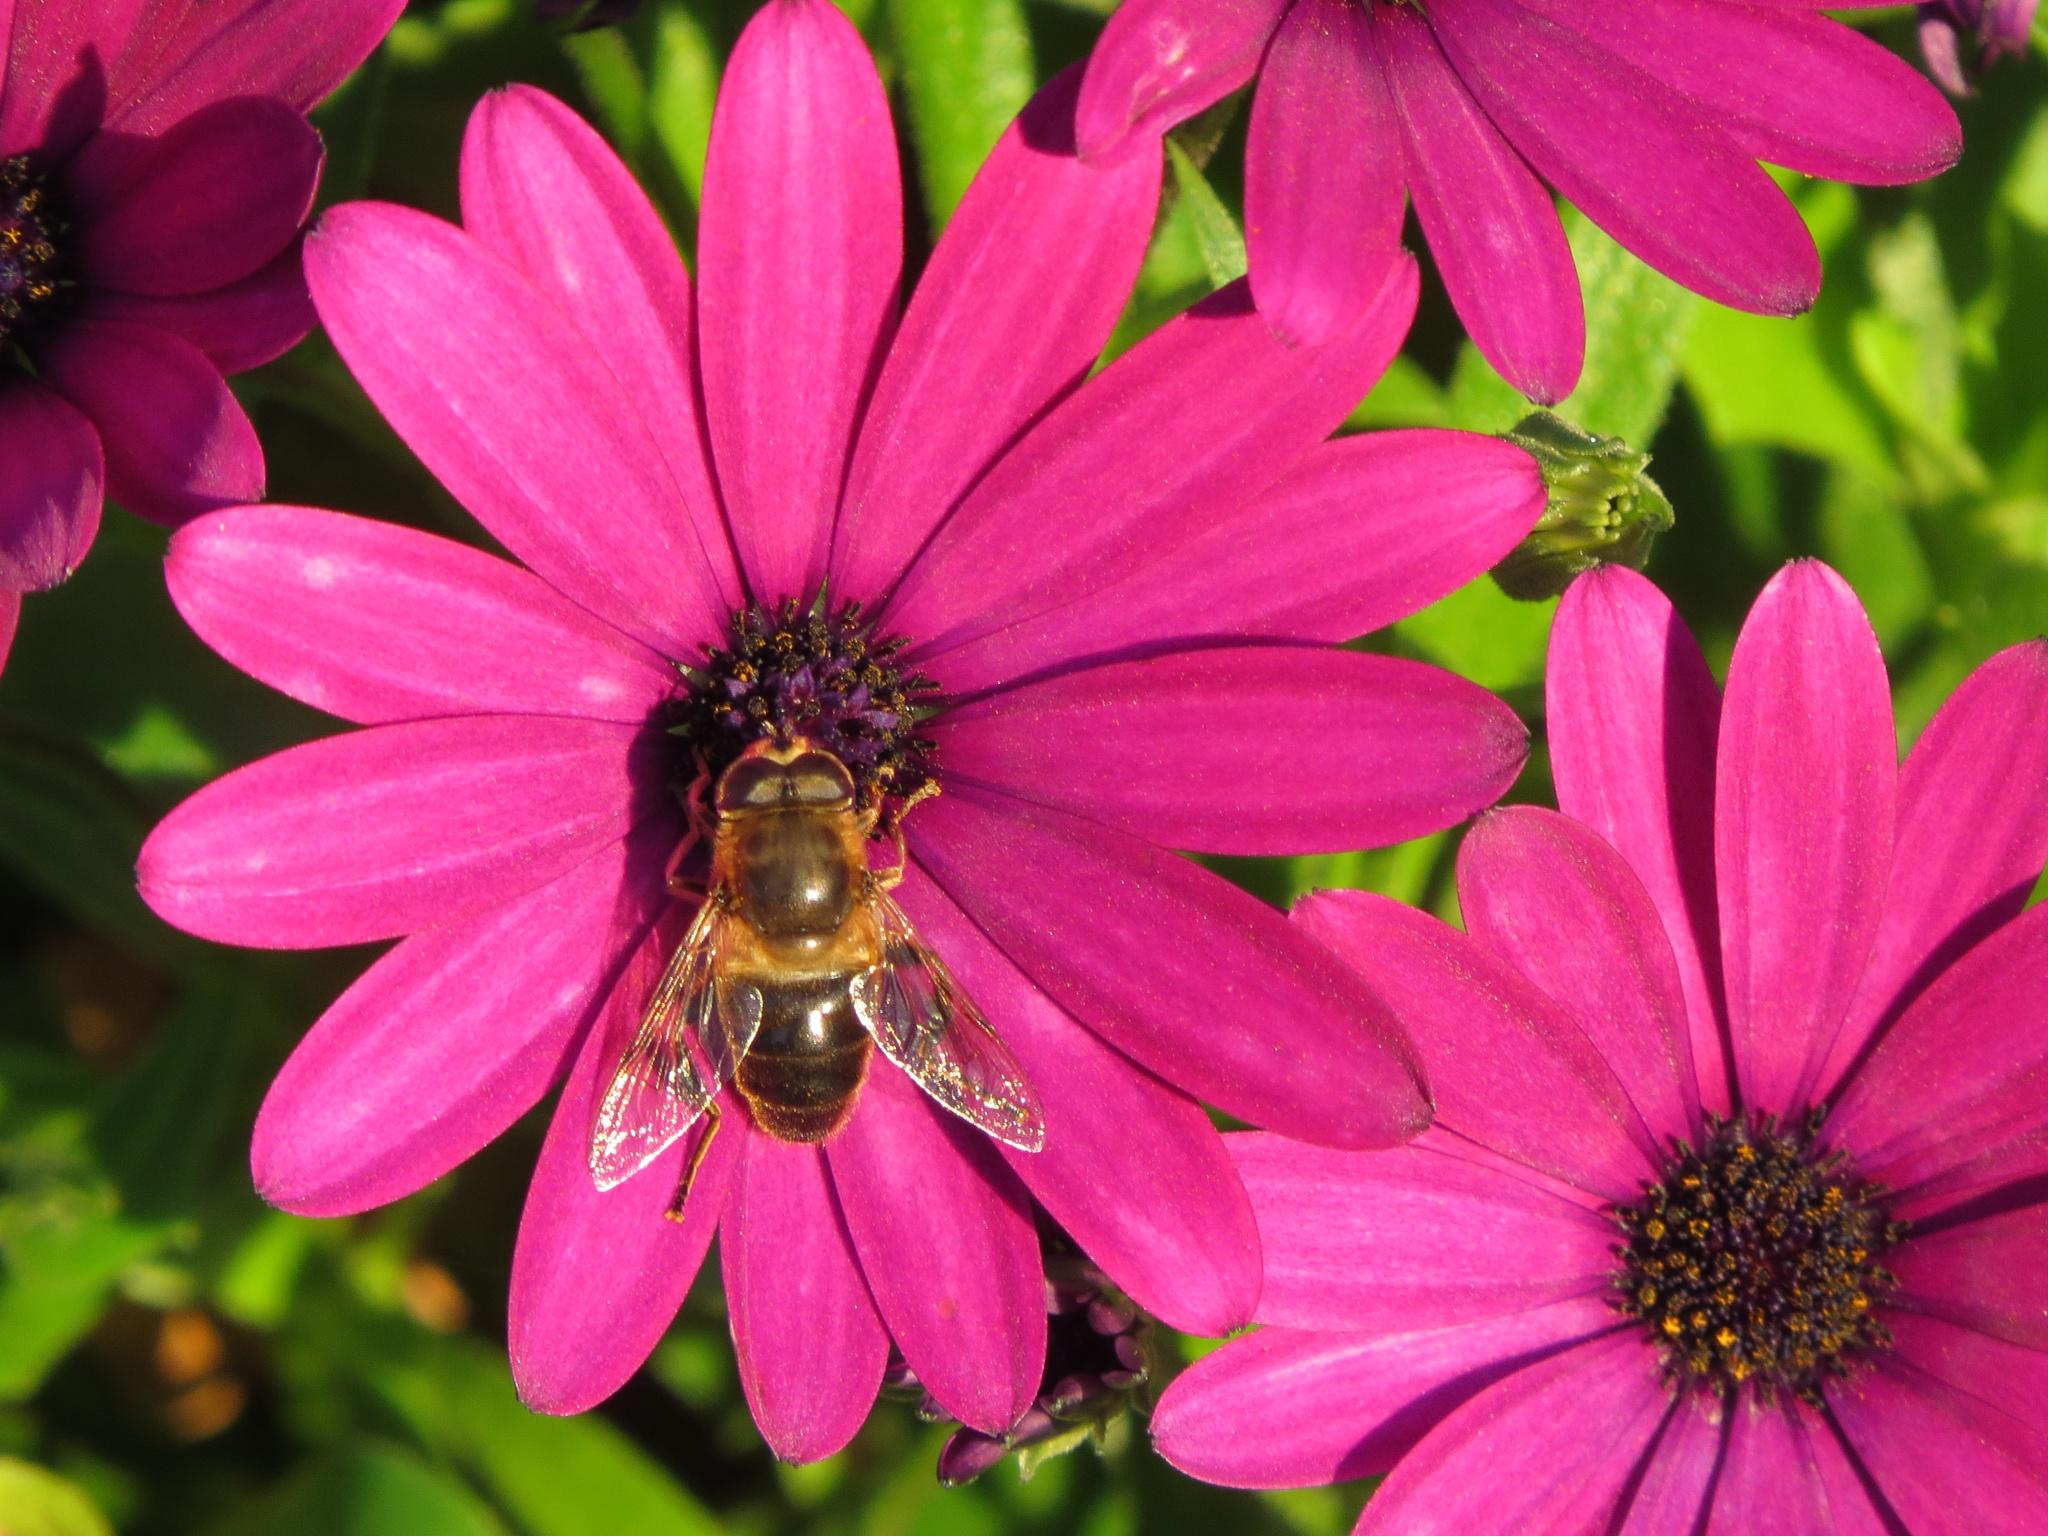 # Flowerfly in October  by marit